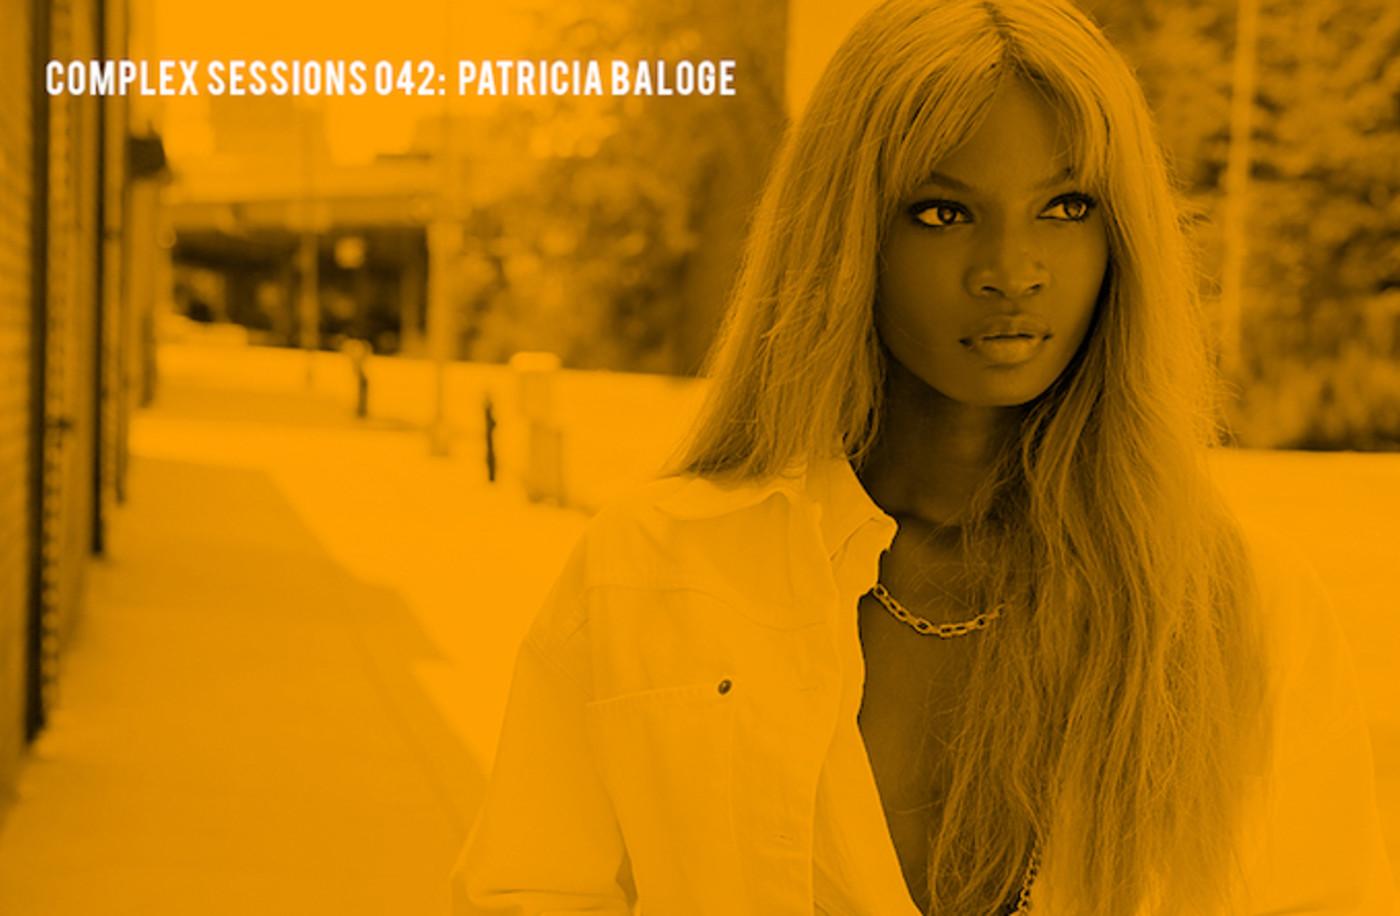 Complex Sessions 042: Patricia Baloge